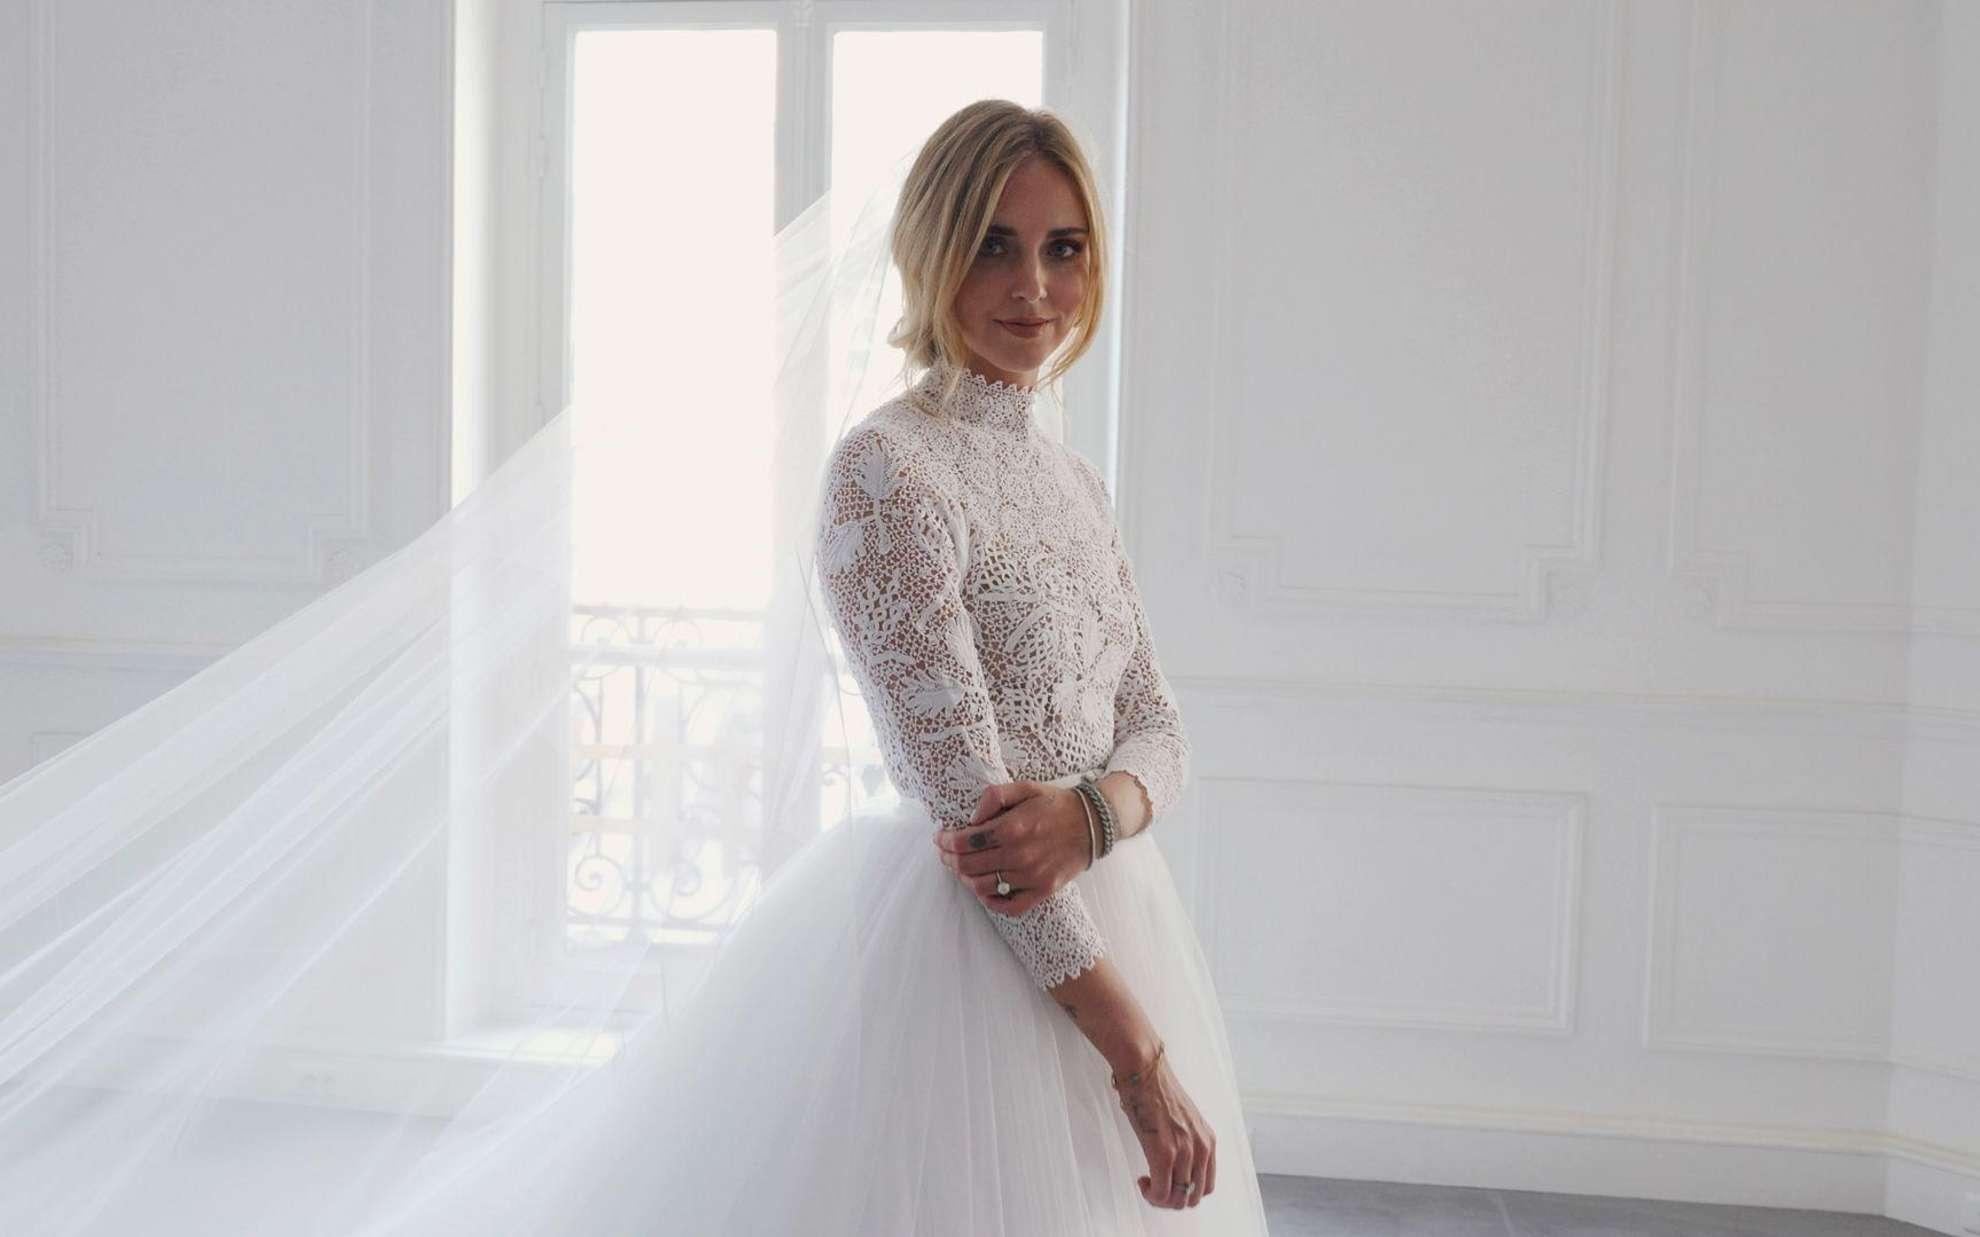 921b95db259 Blogger bride Chiara Ferragni wears three custom Dior dresses at lavish  wedding